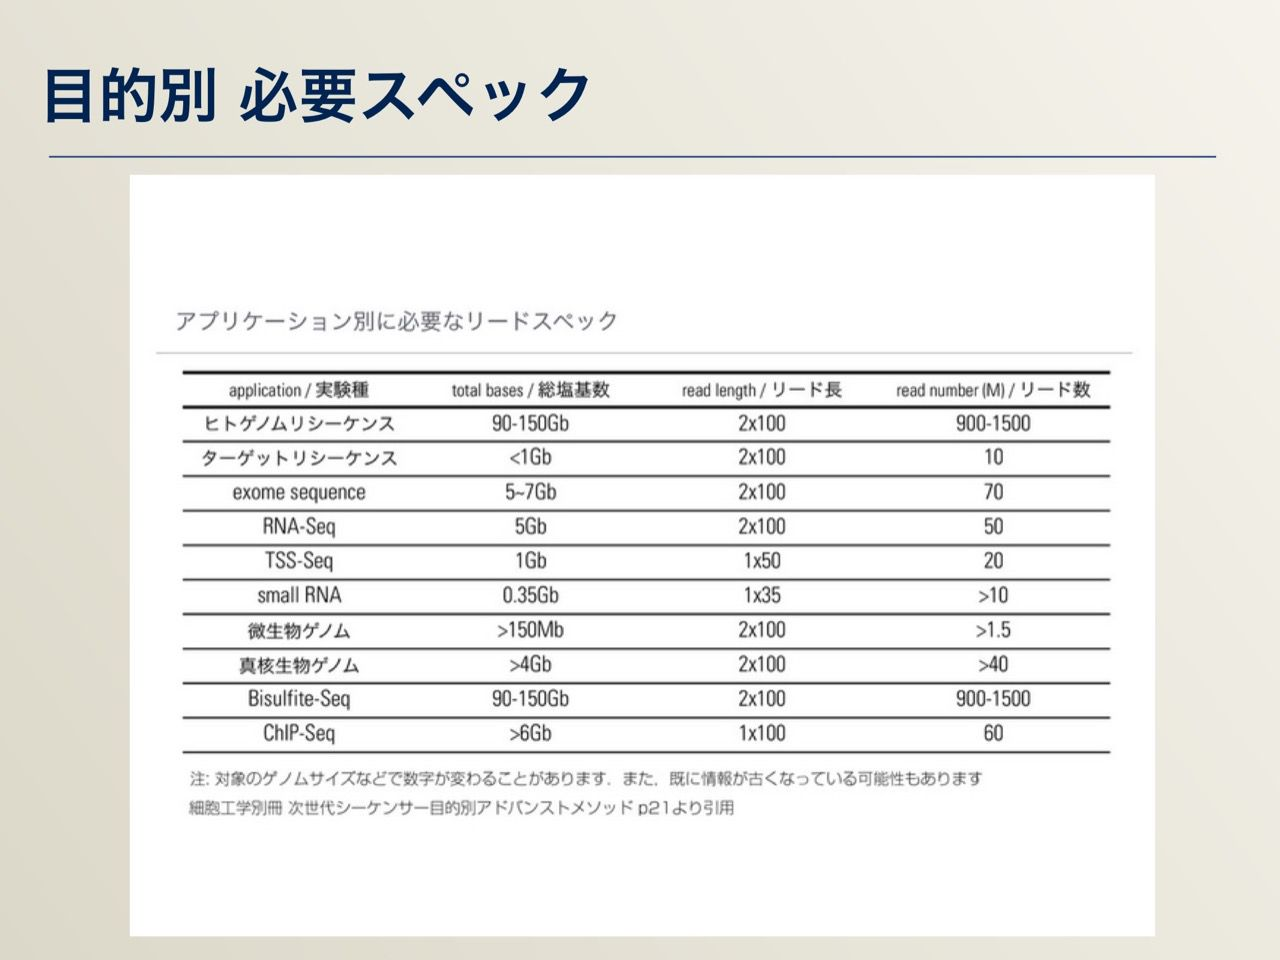 images/AJACS64_03_nakazato_005.jpg